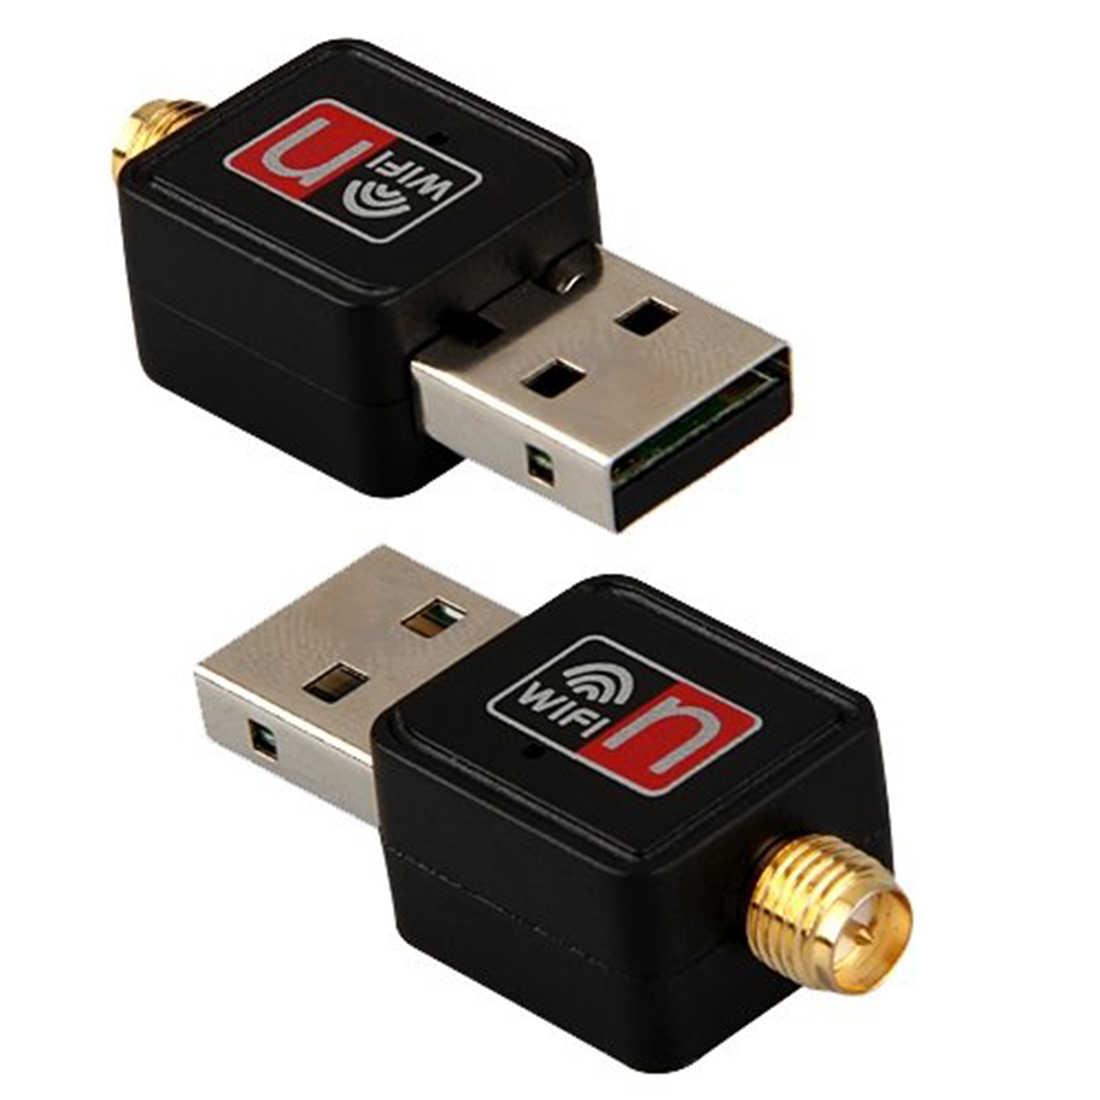 NOYOKERE Ethernet 150Mbps 2dB Mini USB Wifi adaptador antena PC USB receptor Wifi tarjeta de red inalámbrica